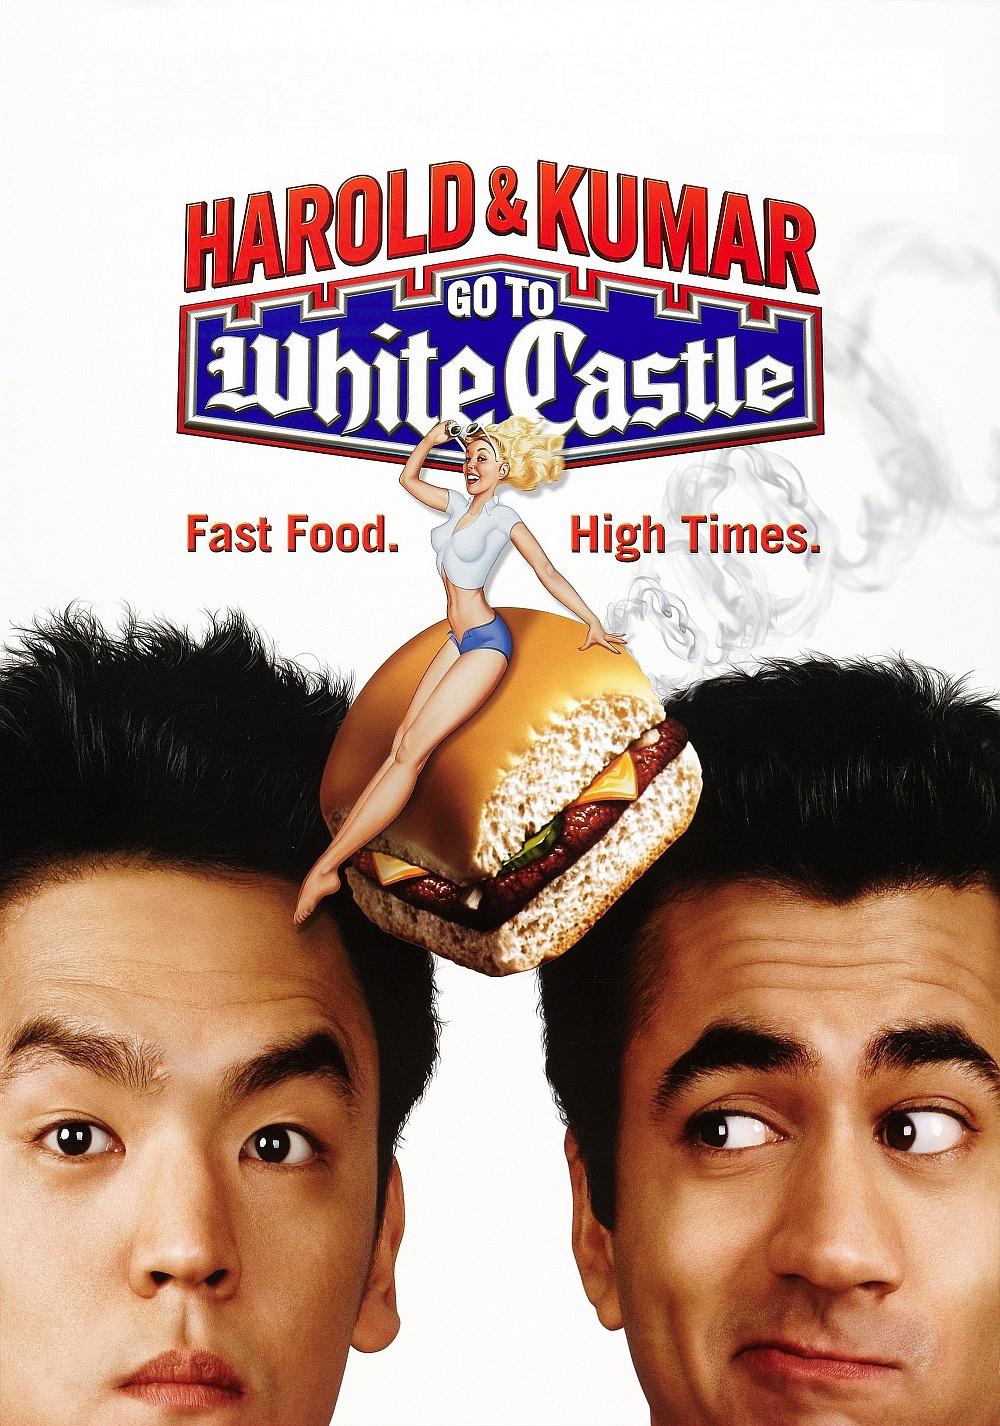 harold--kumar-go-to-white-castle-53280b264aa8a